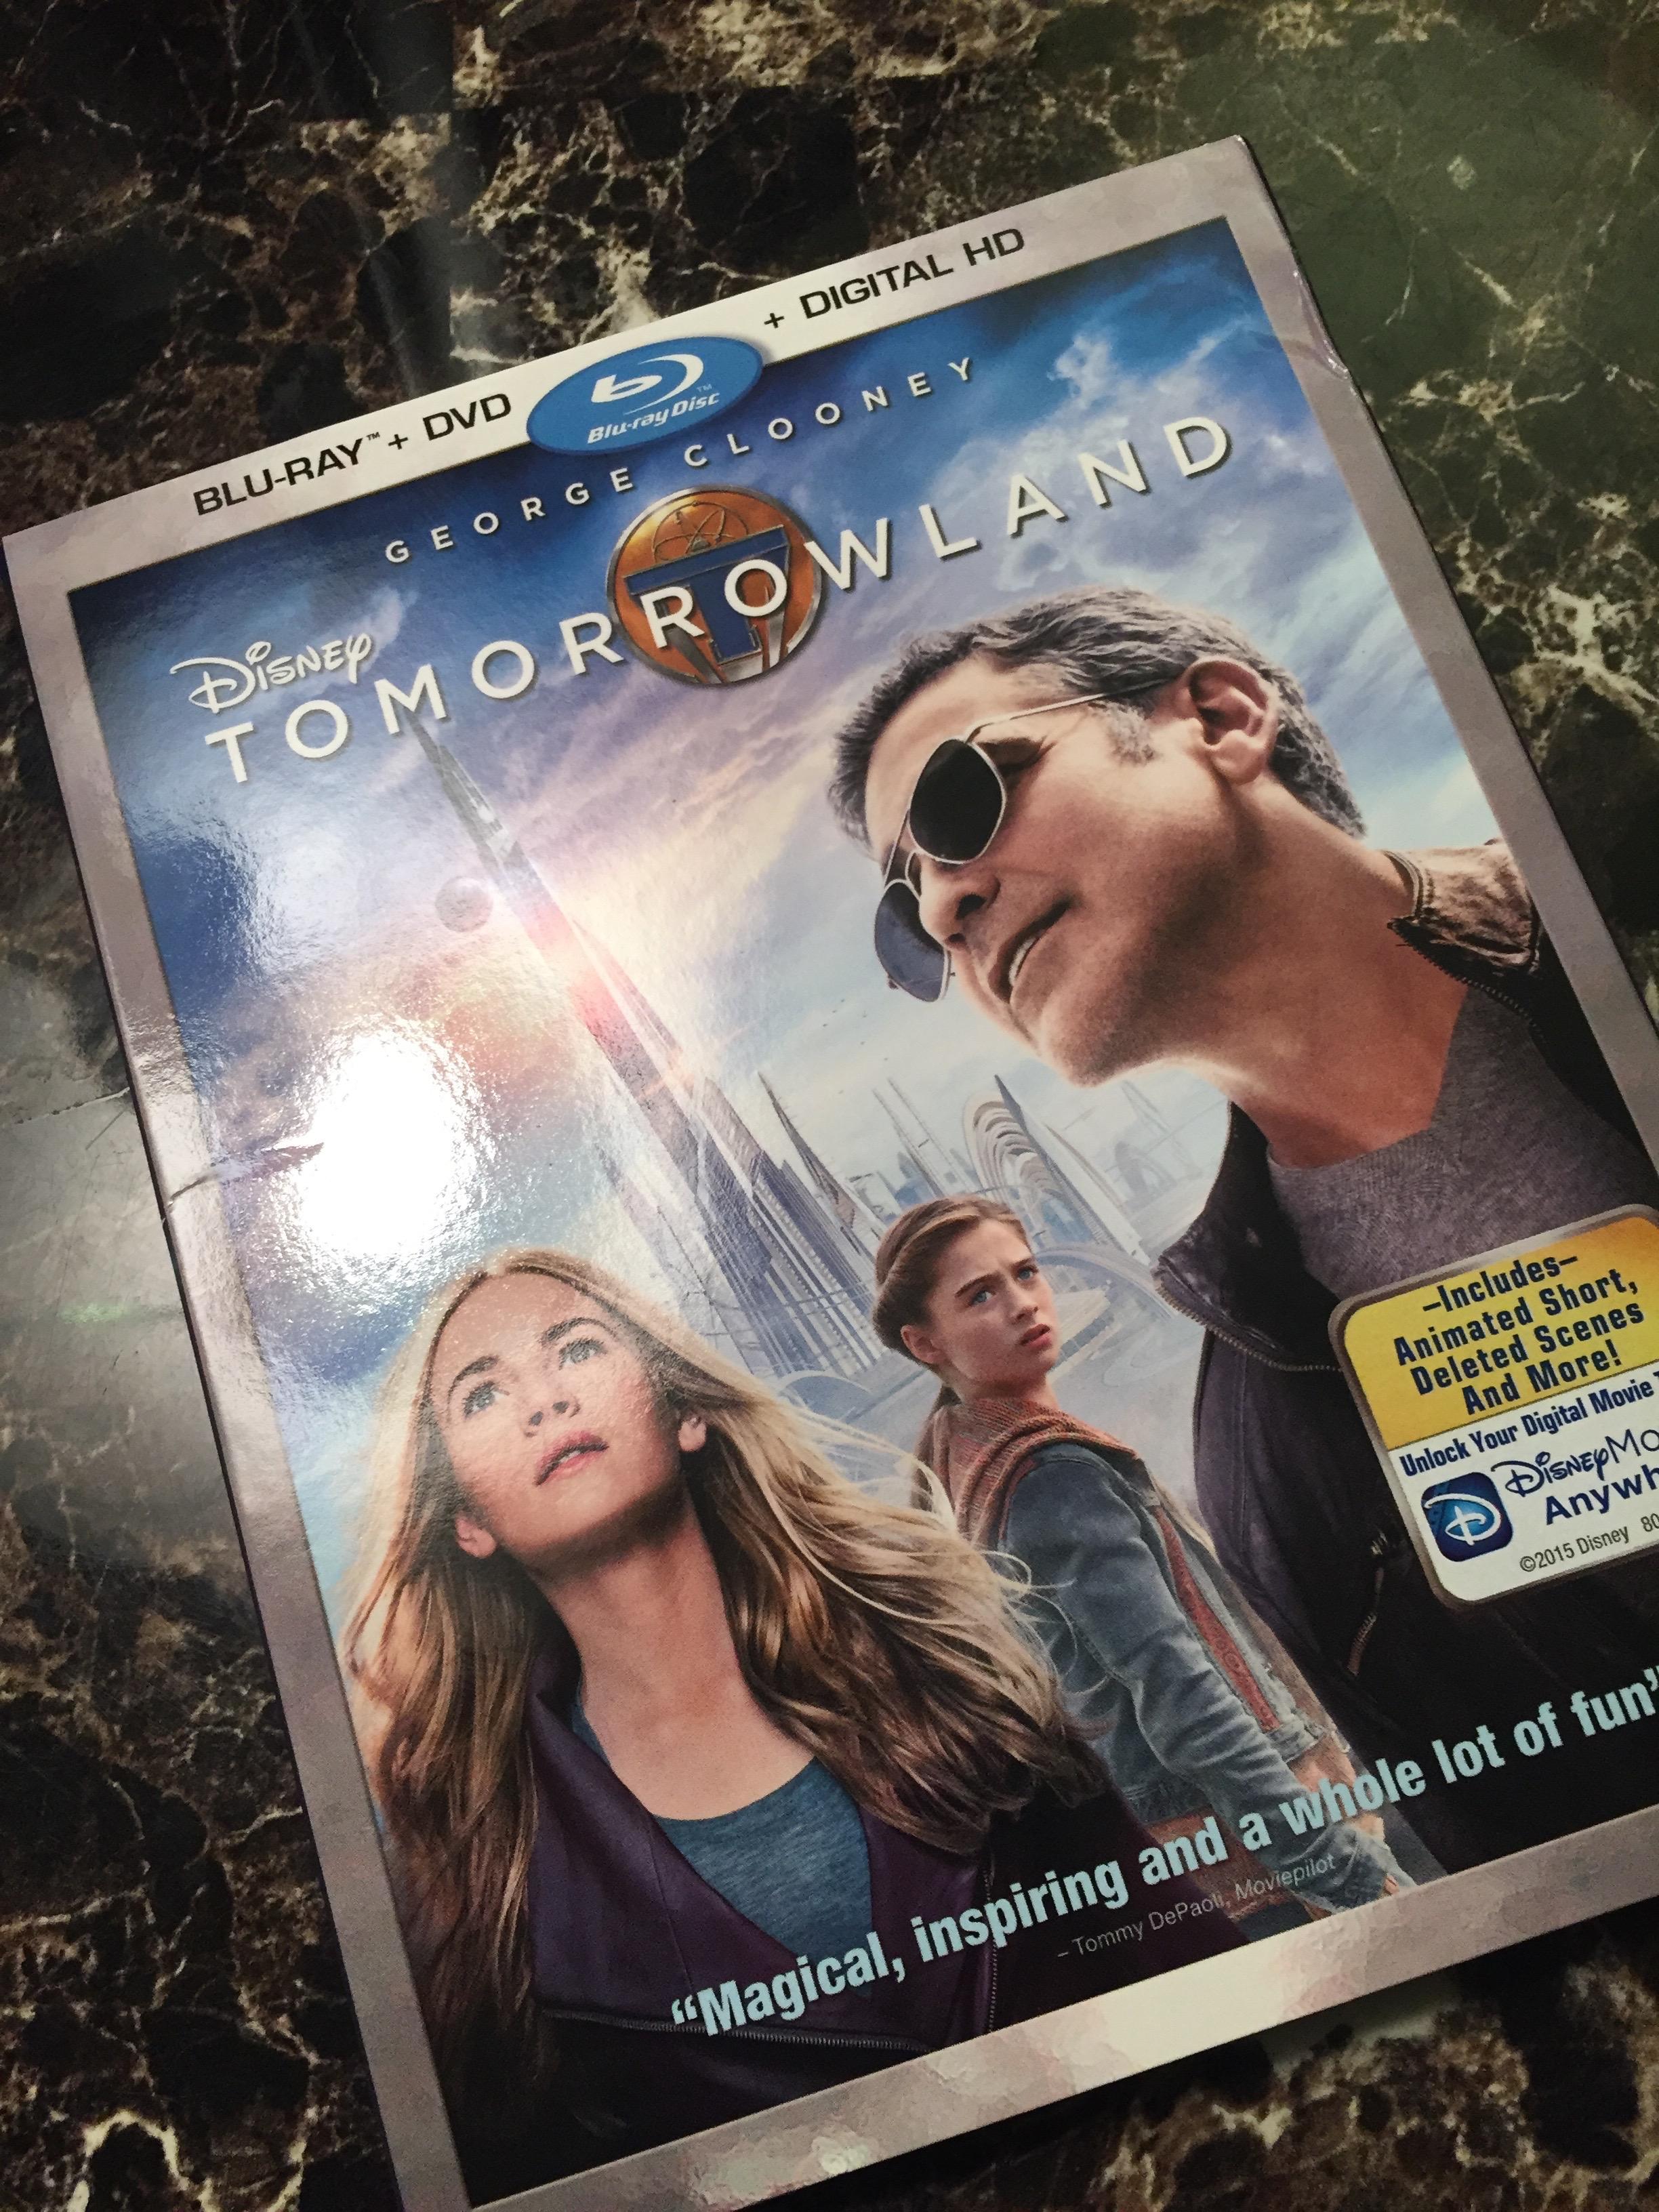 Tomorrowland Deserves A Second Chance Bluraydvd Review Disney Nerds